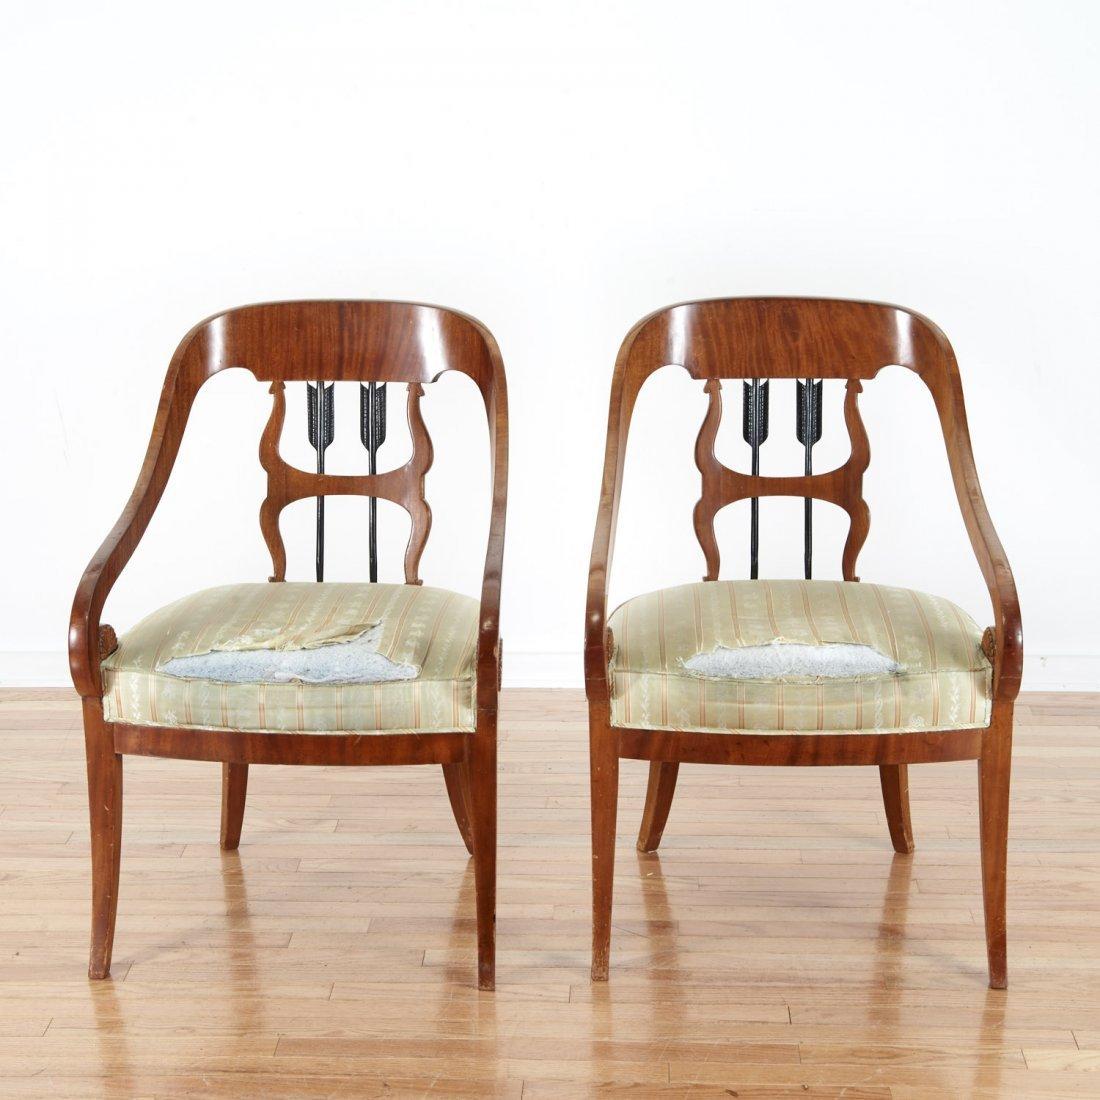 Pair Empire style parcel ebonized walnut armchairs